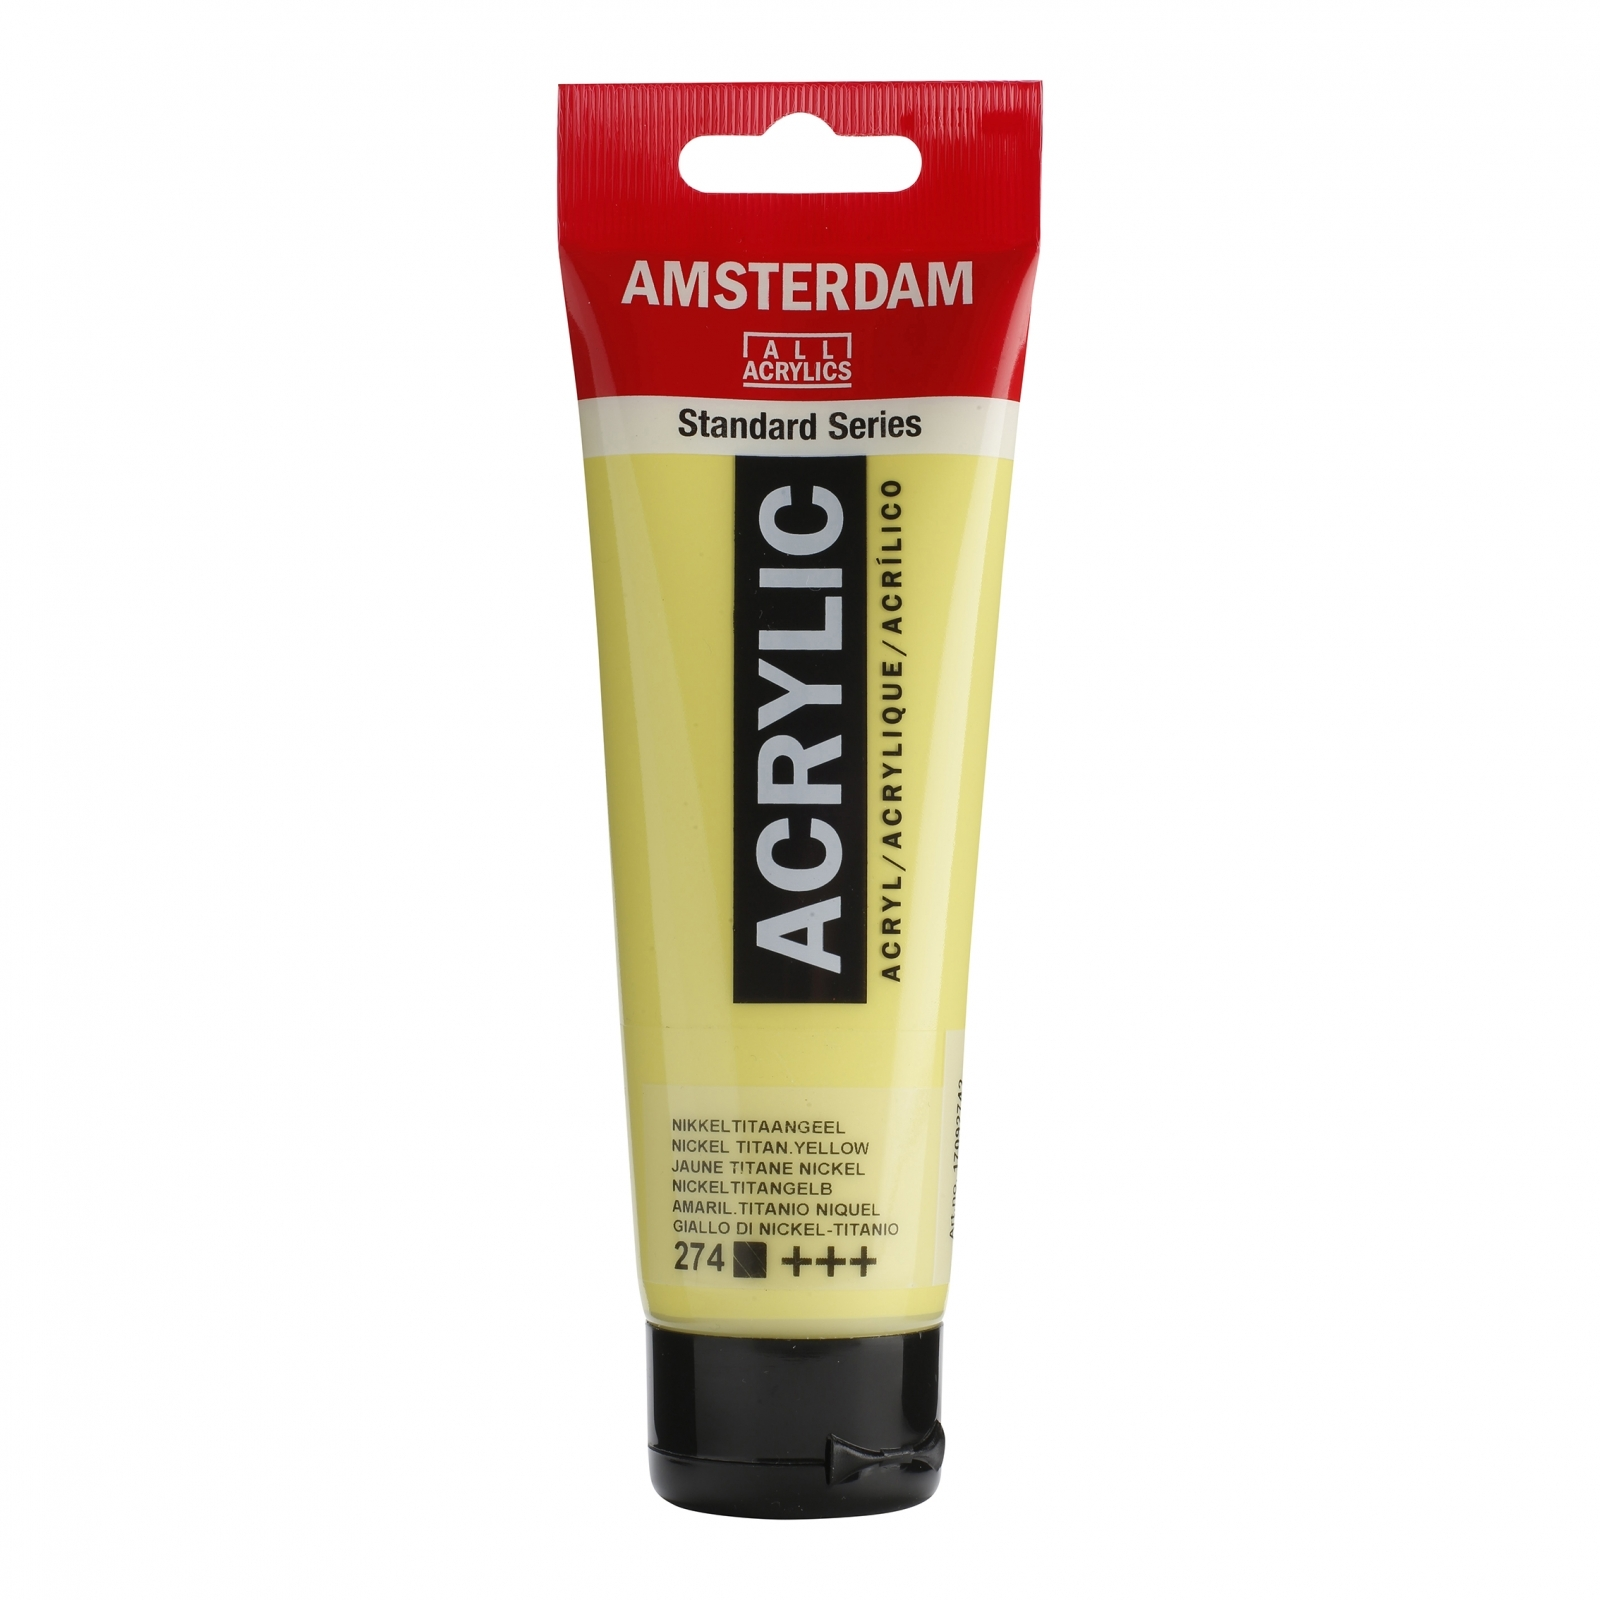 Tinta Acrílica Amsterdam Amarelo Titâneo Nick 120ml (+++274) - Papelaria Botafogo